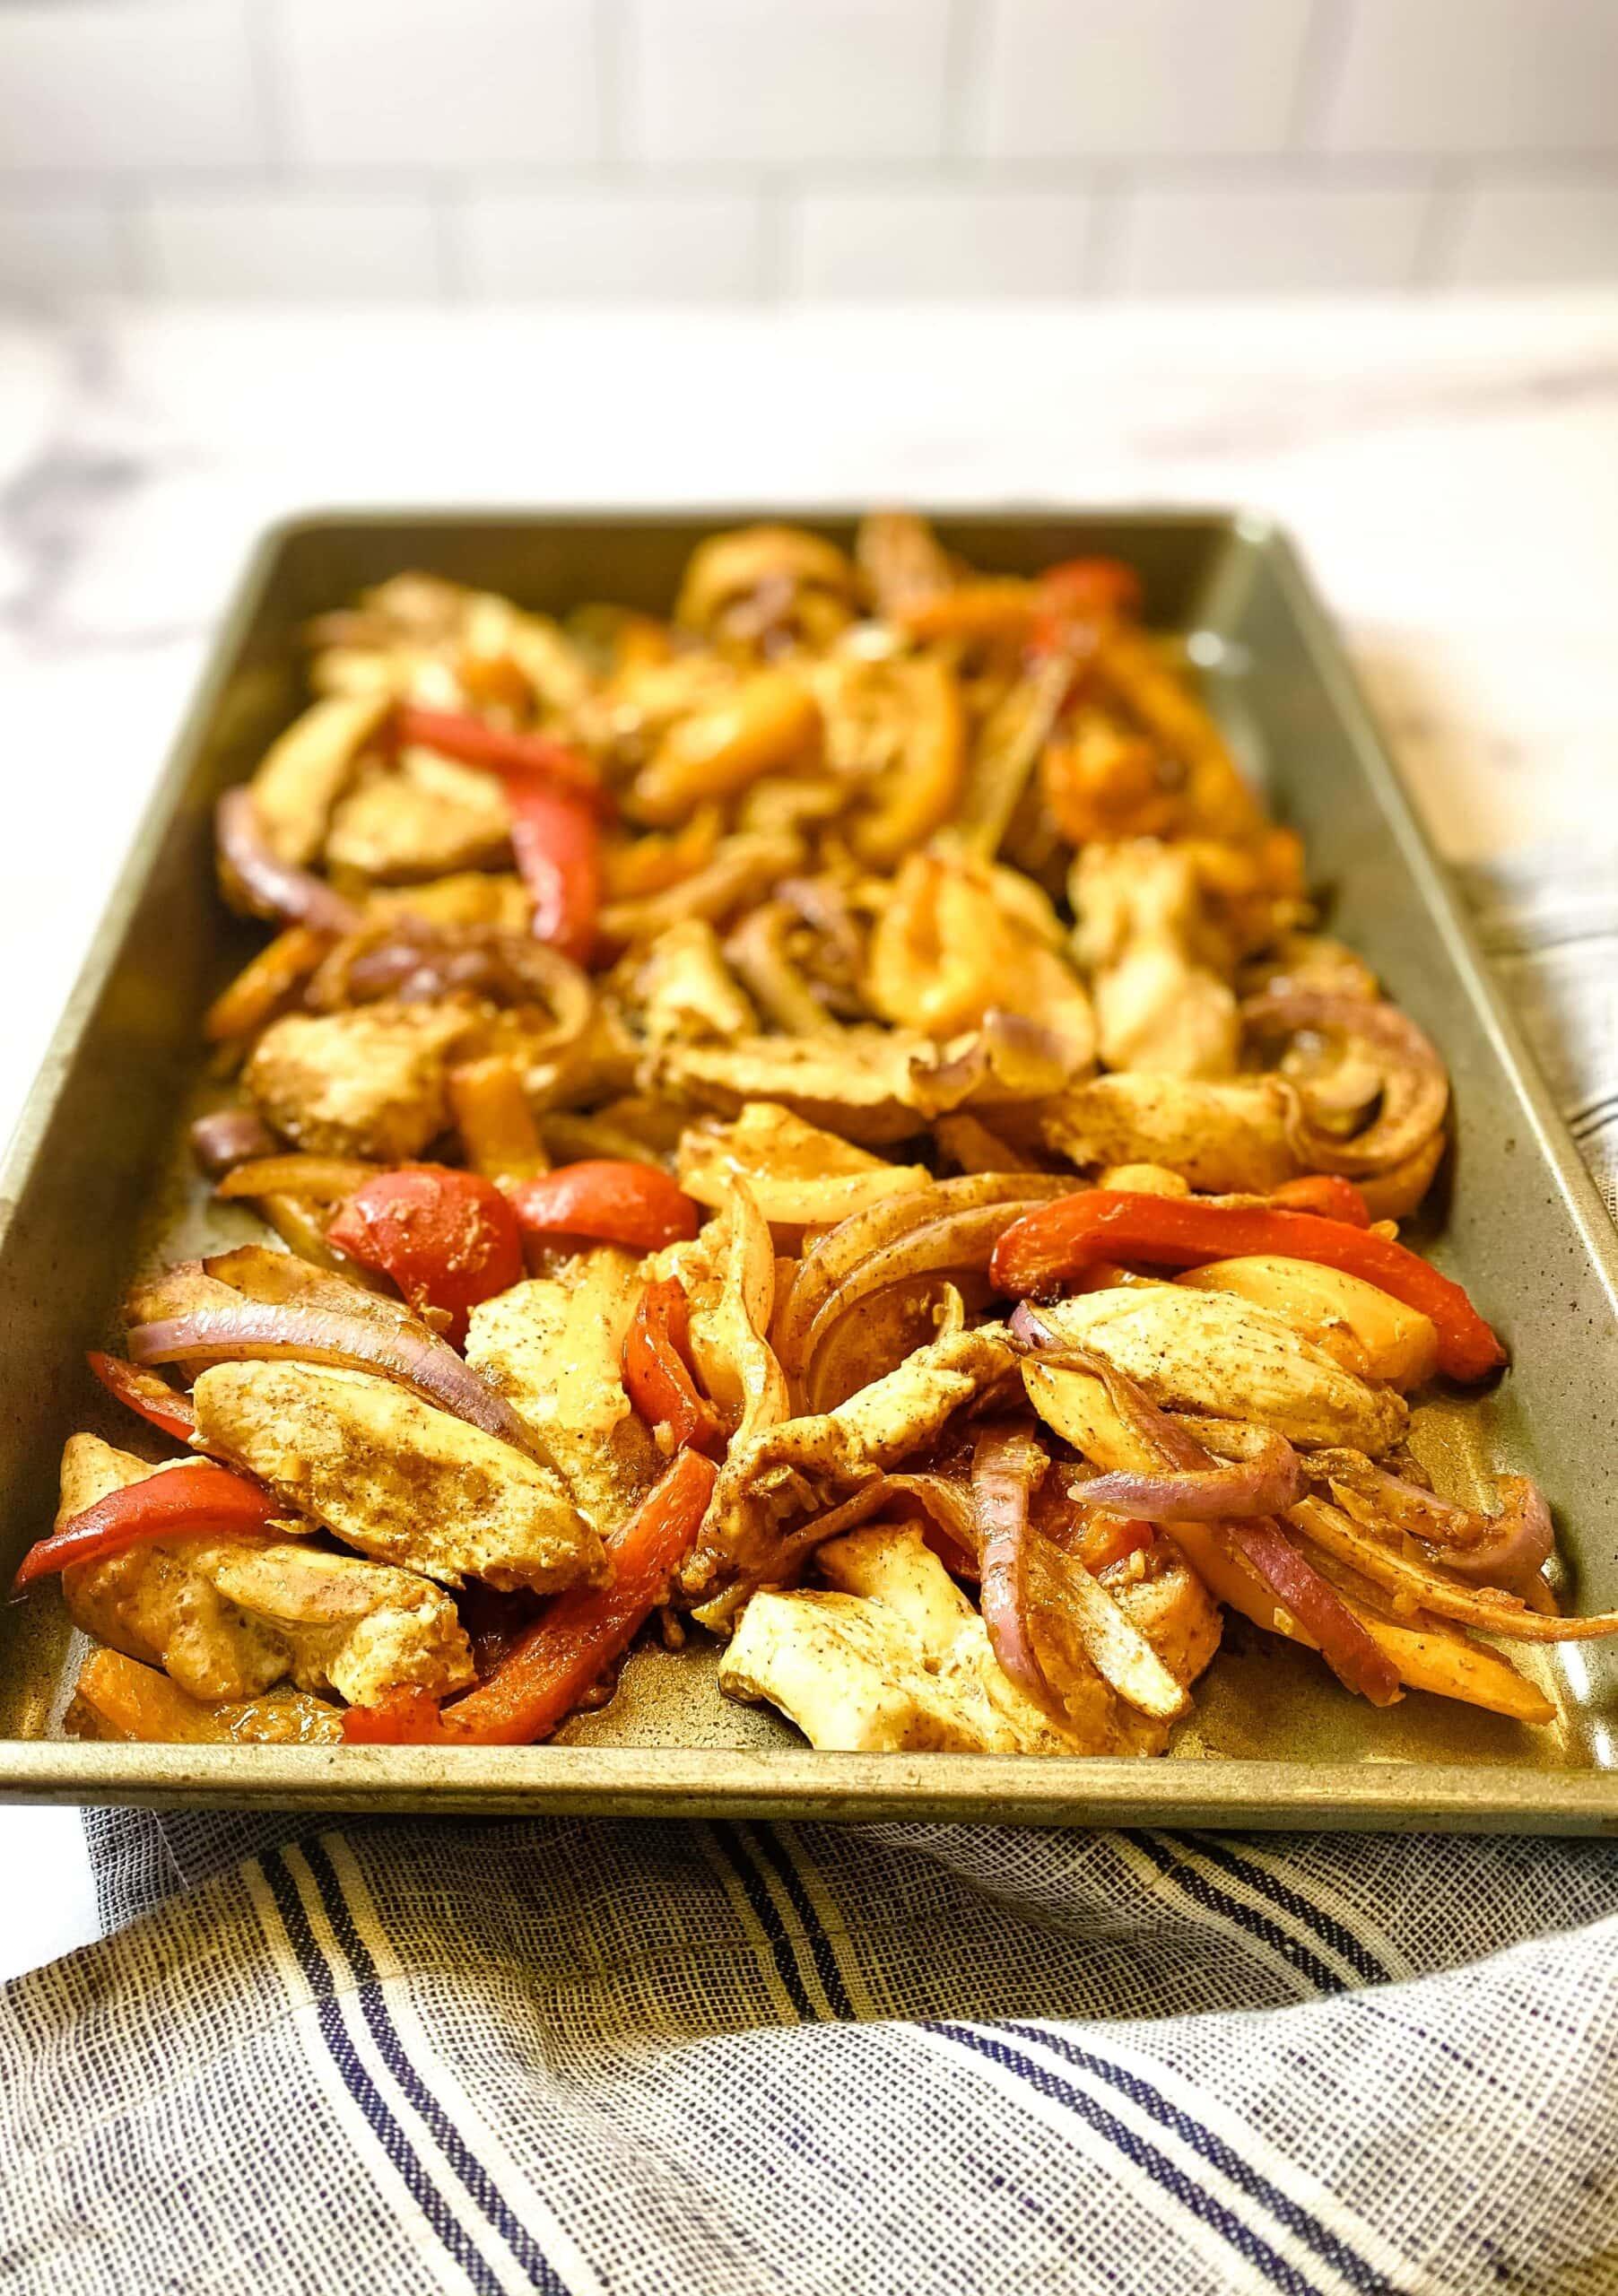 Easy 30-Minute Sheet Pan Chicken Fajitas